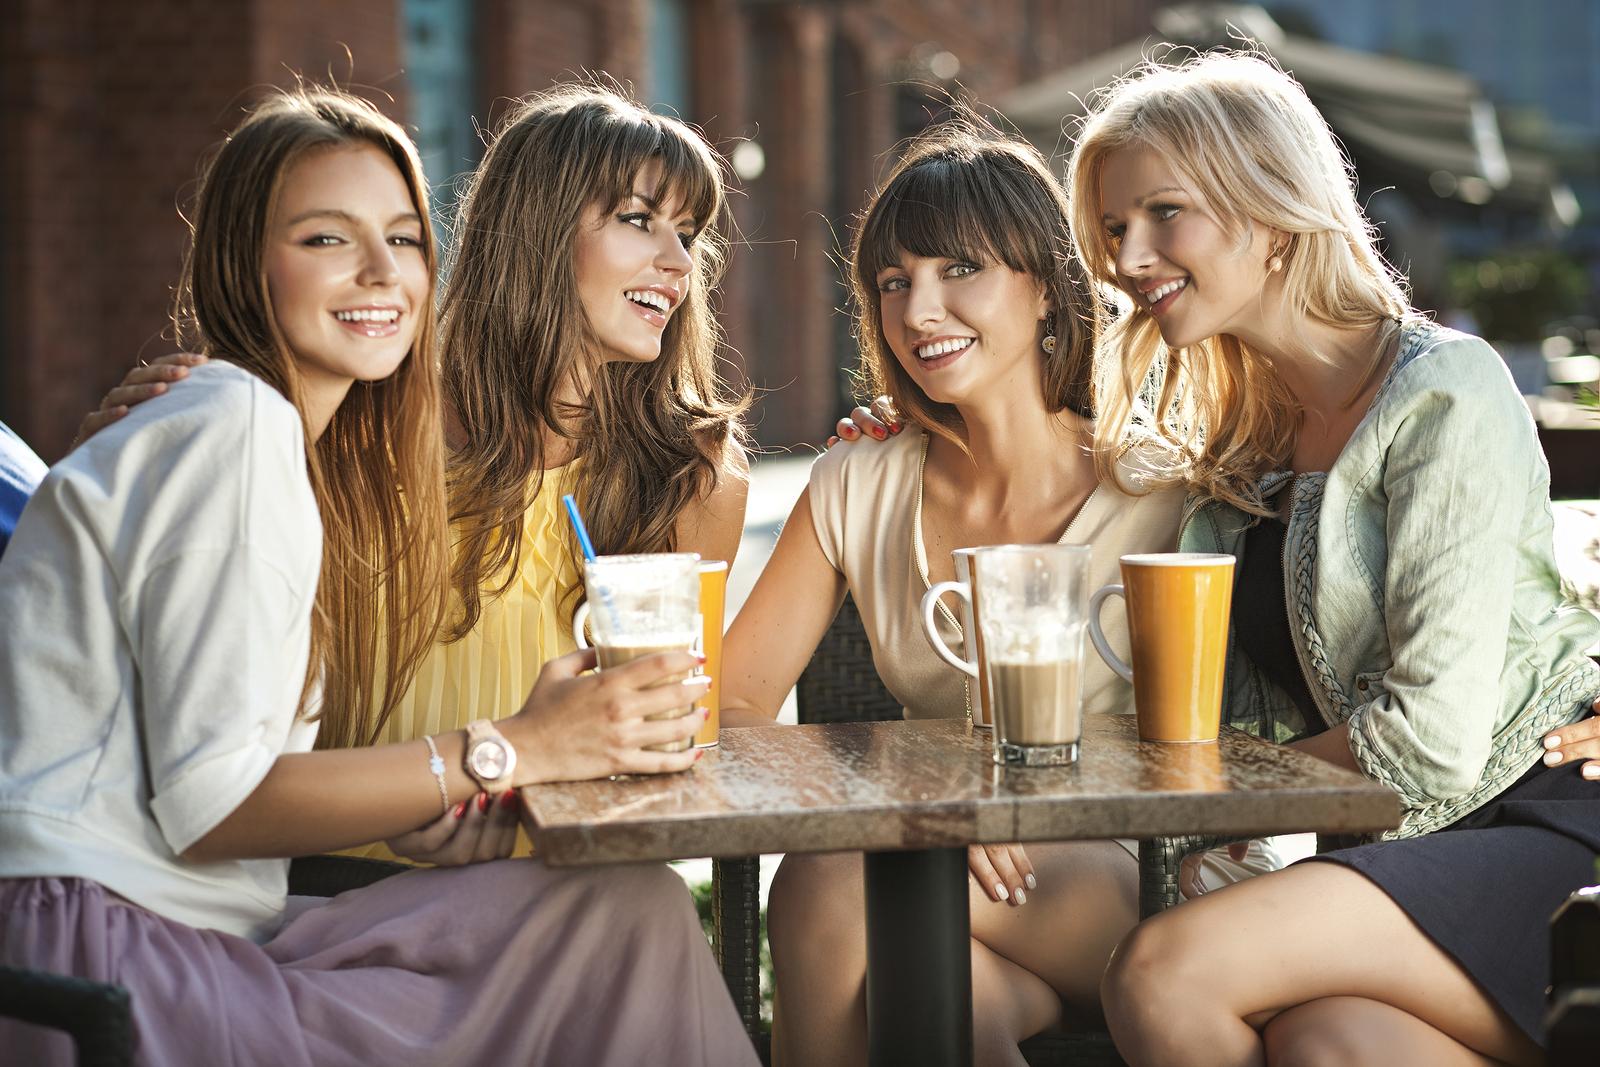 5 ways to meet